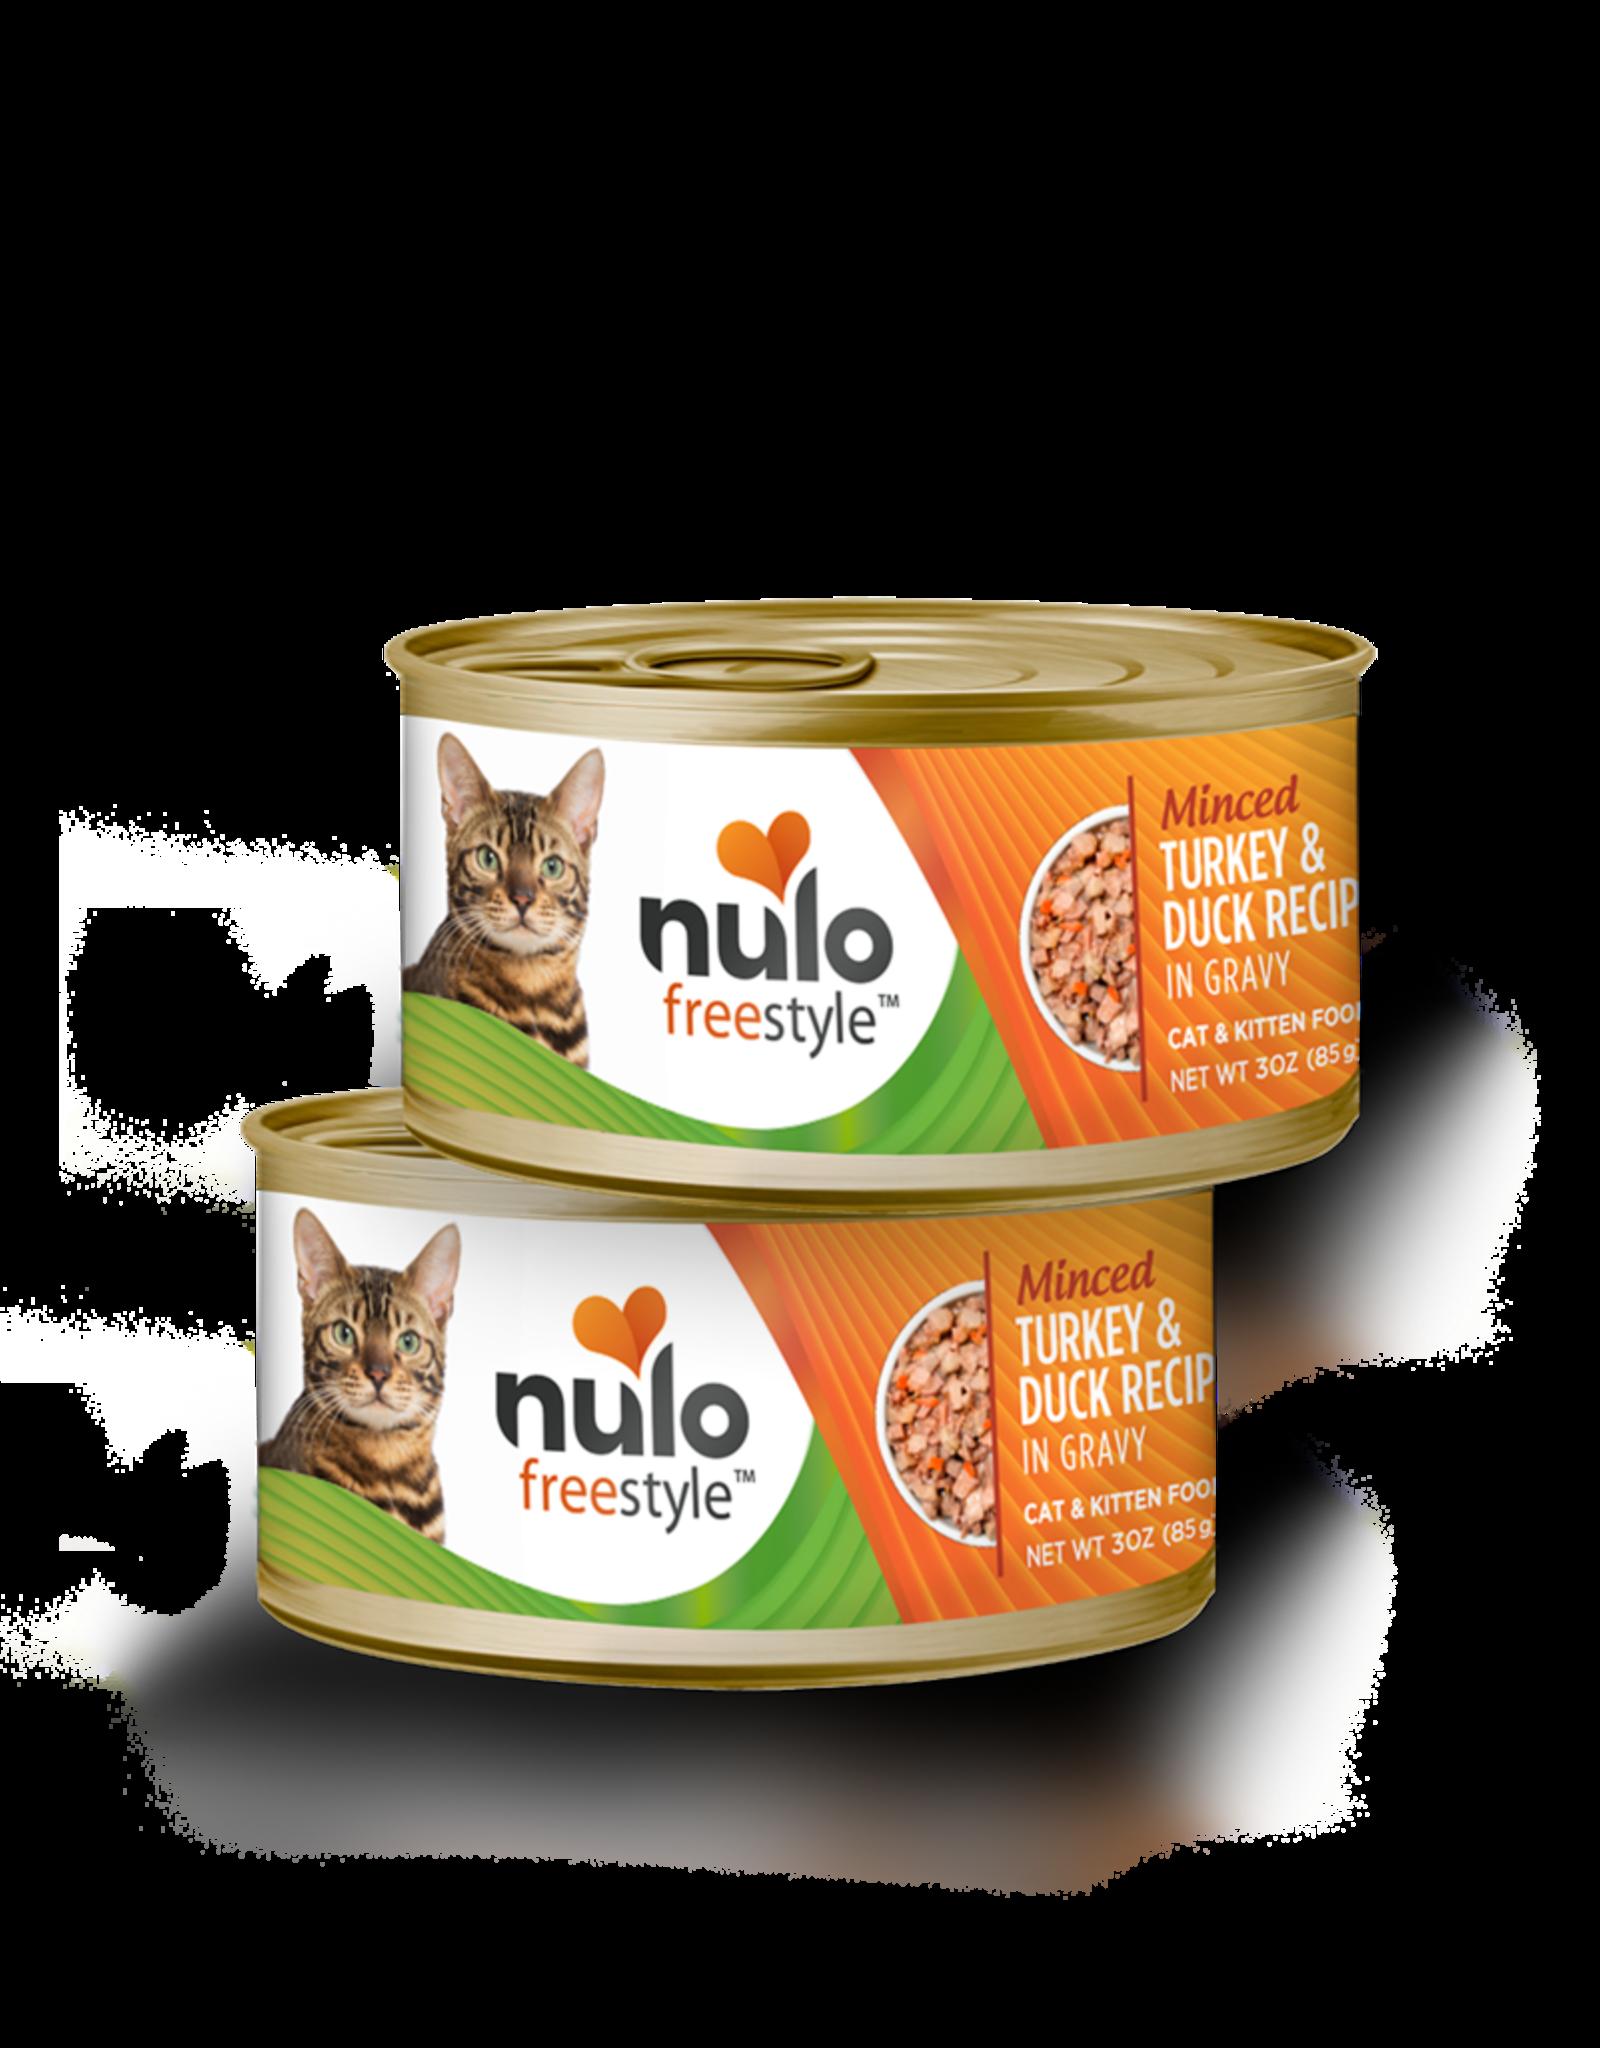 Nulo Nulo Freestyle Wet Cat Food Minced Turkey & Duck Recipe in Gravy 3oz Can Grain Free